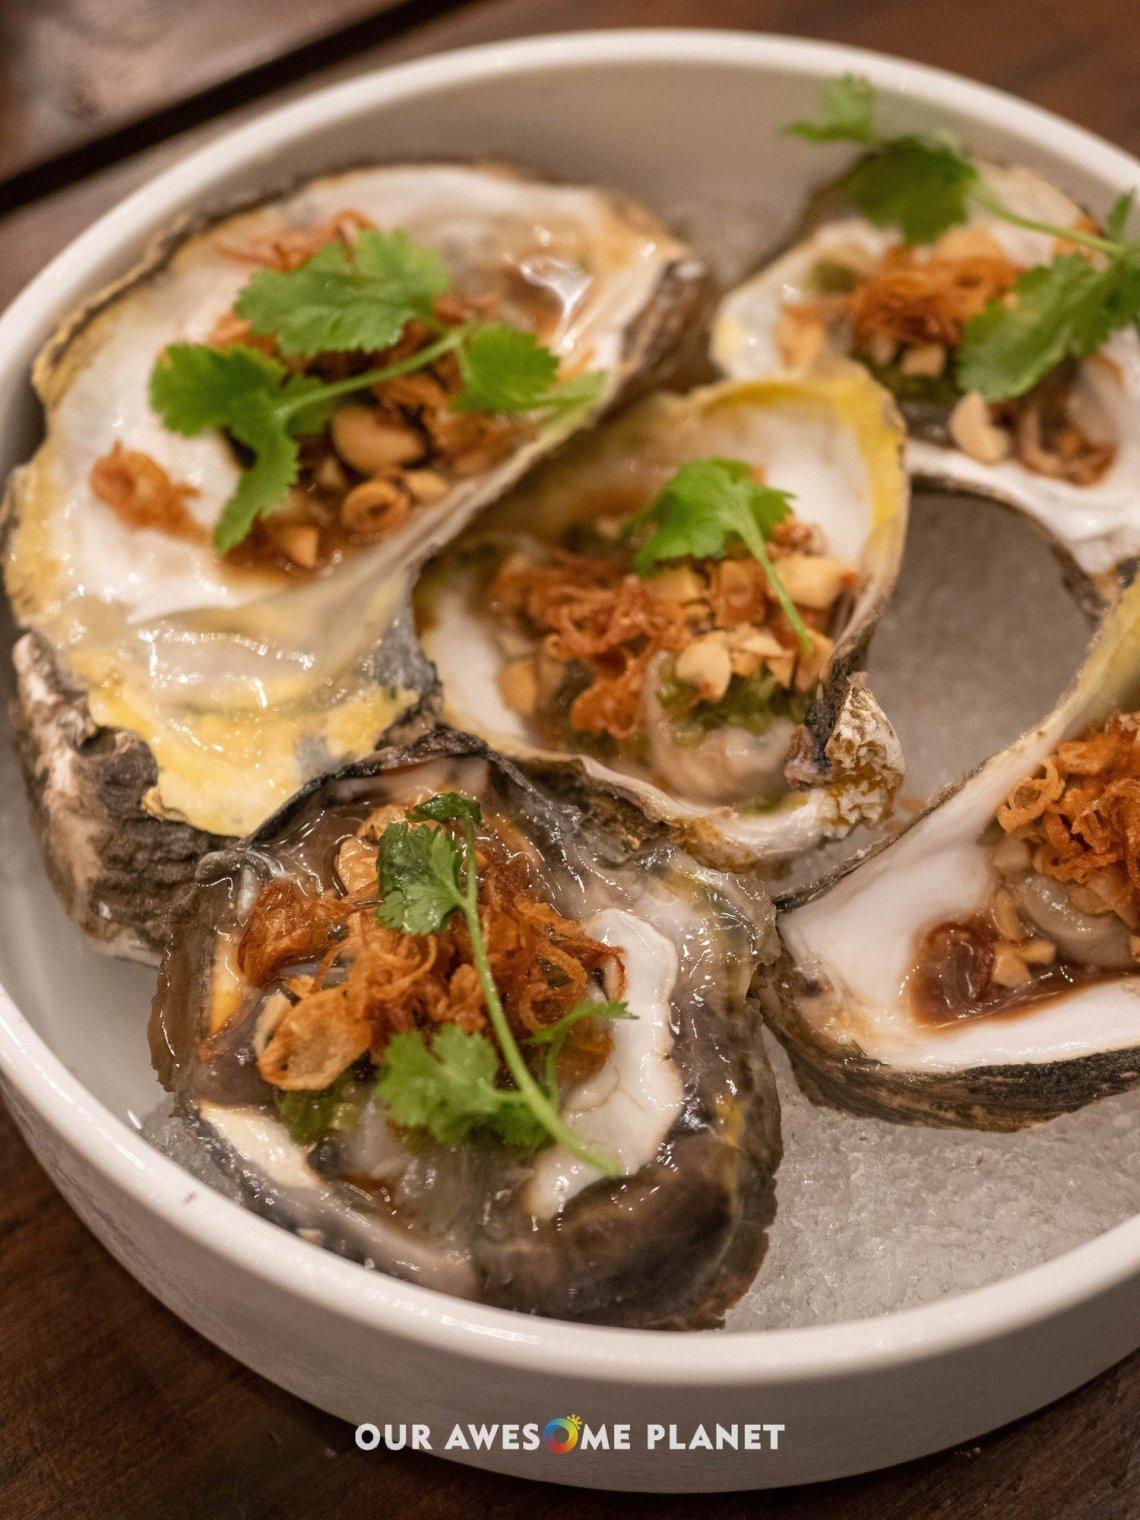 Fresh Oysters (₱250)